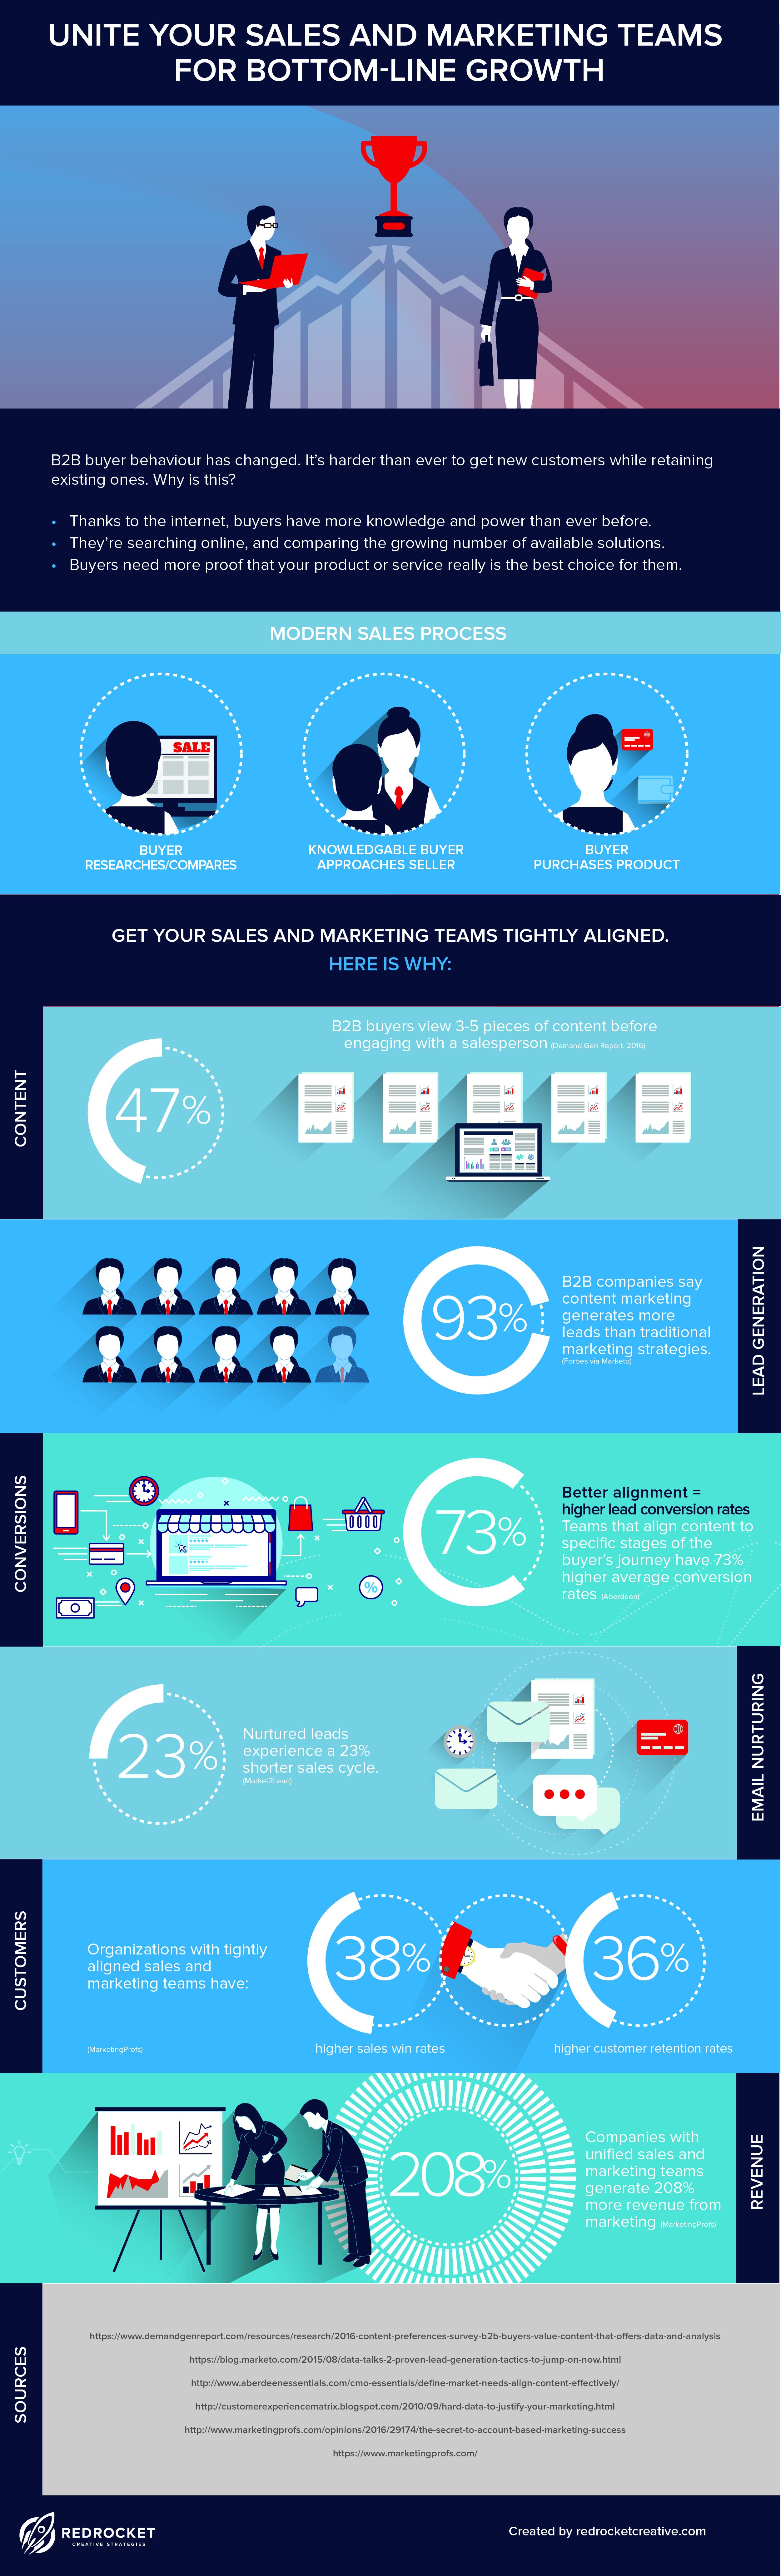 sales-and-marketing-alignment-statistics